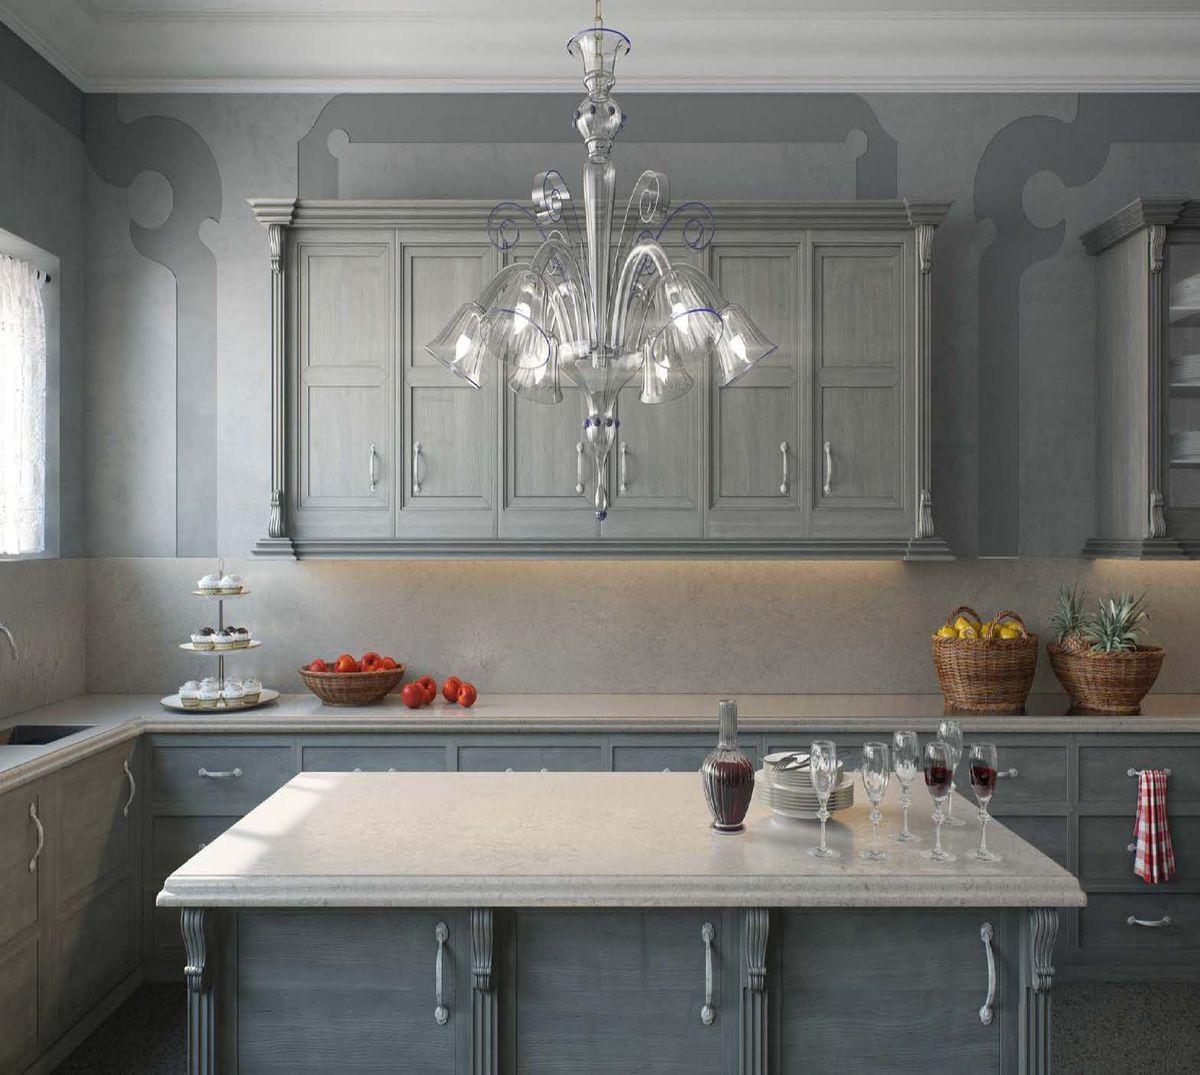 20 Ideas For Grey Kitchens Both: Kitchen Design, French Kitchen